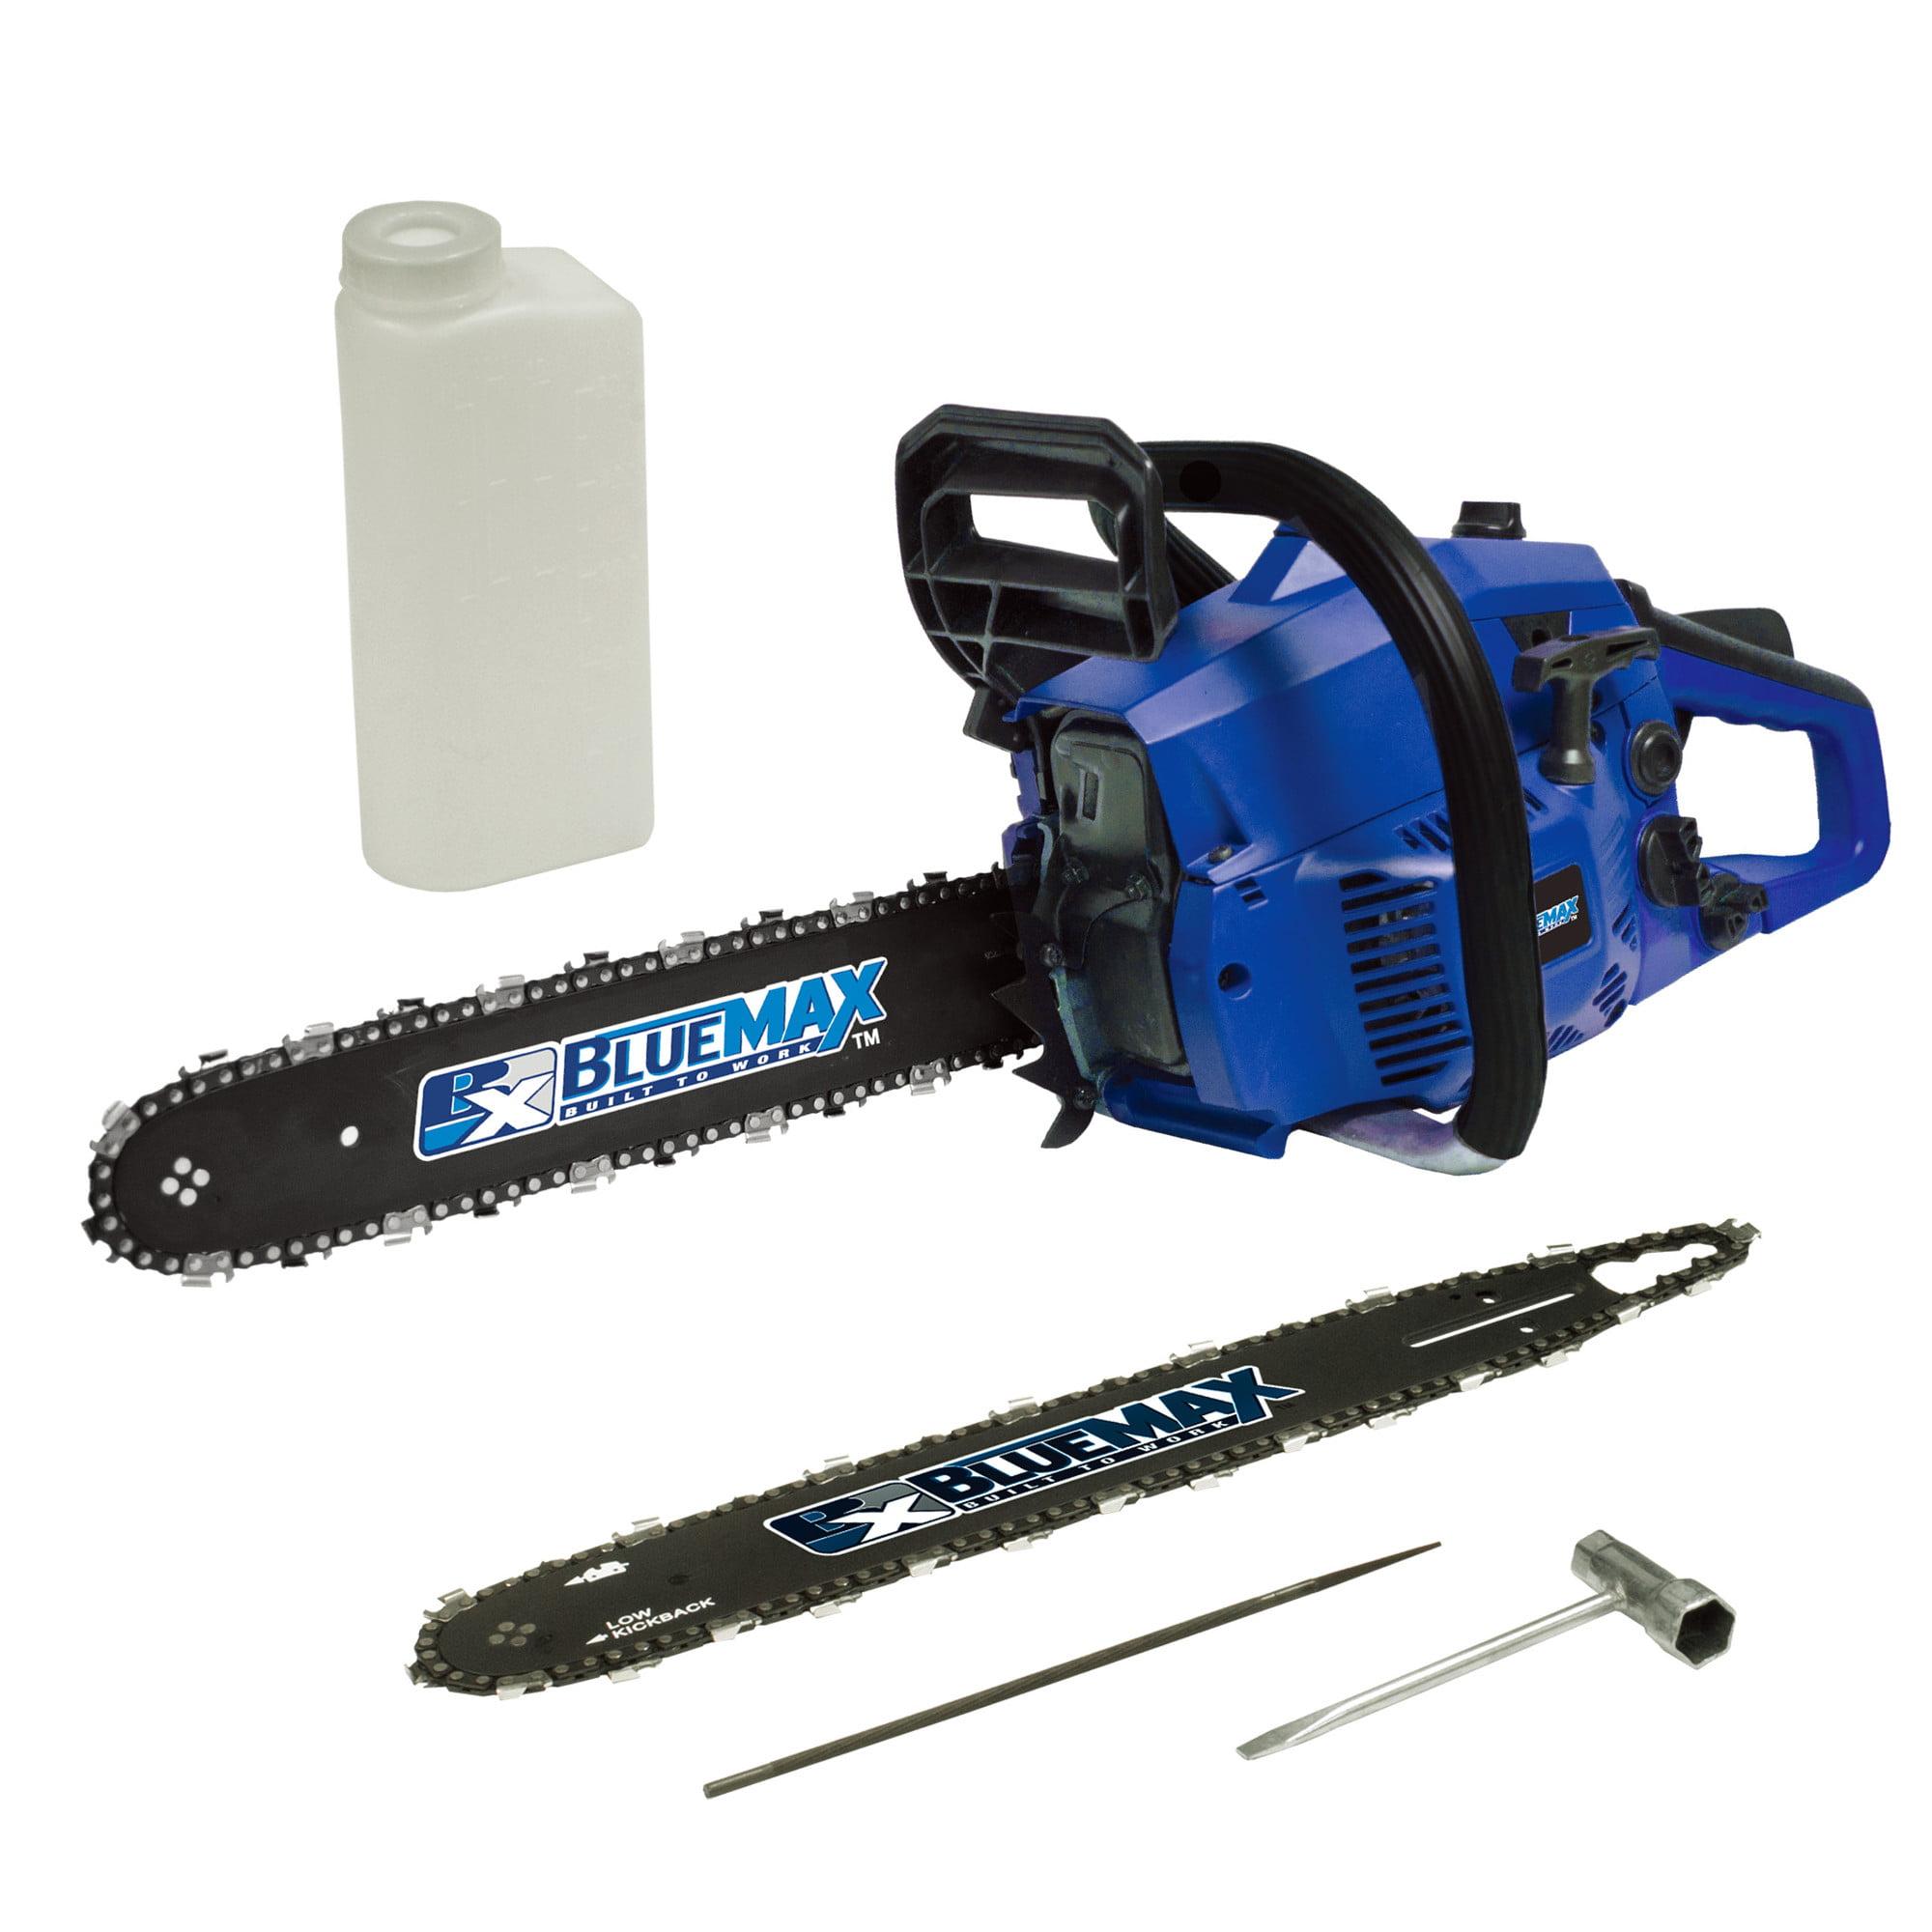 "Blue Max 14"" & 18"" Combo Chainsaw ) 38cc EPA by NATI"